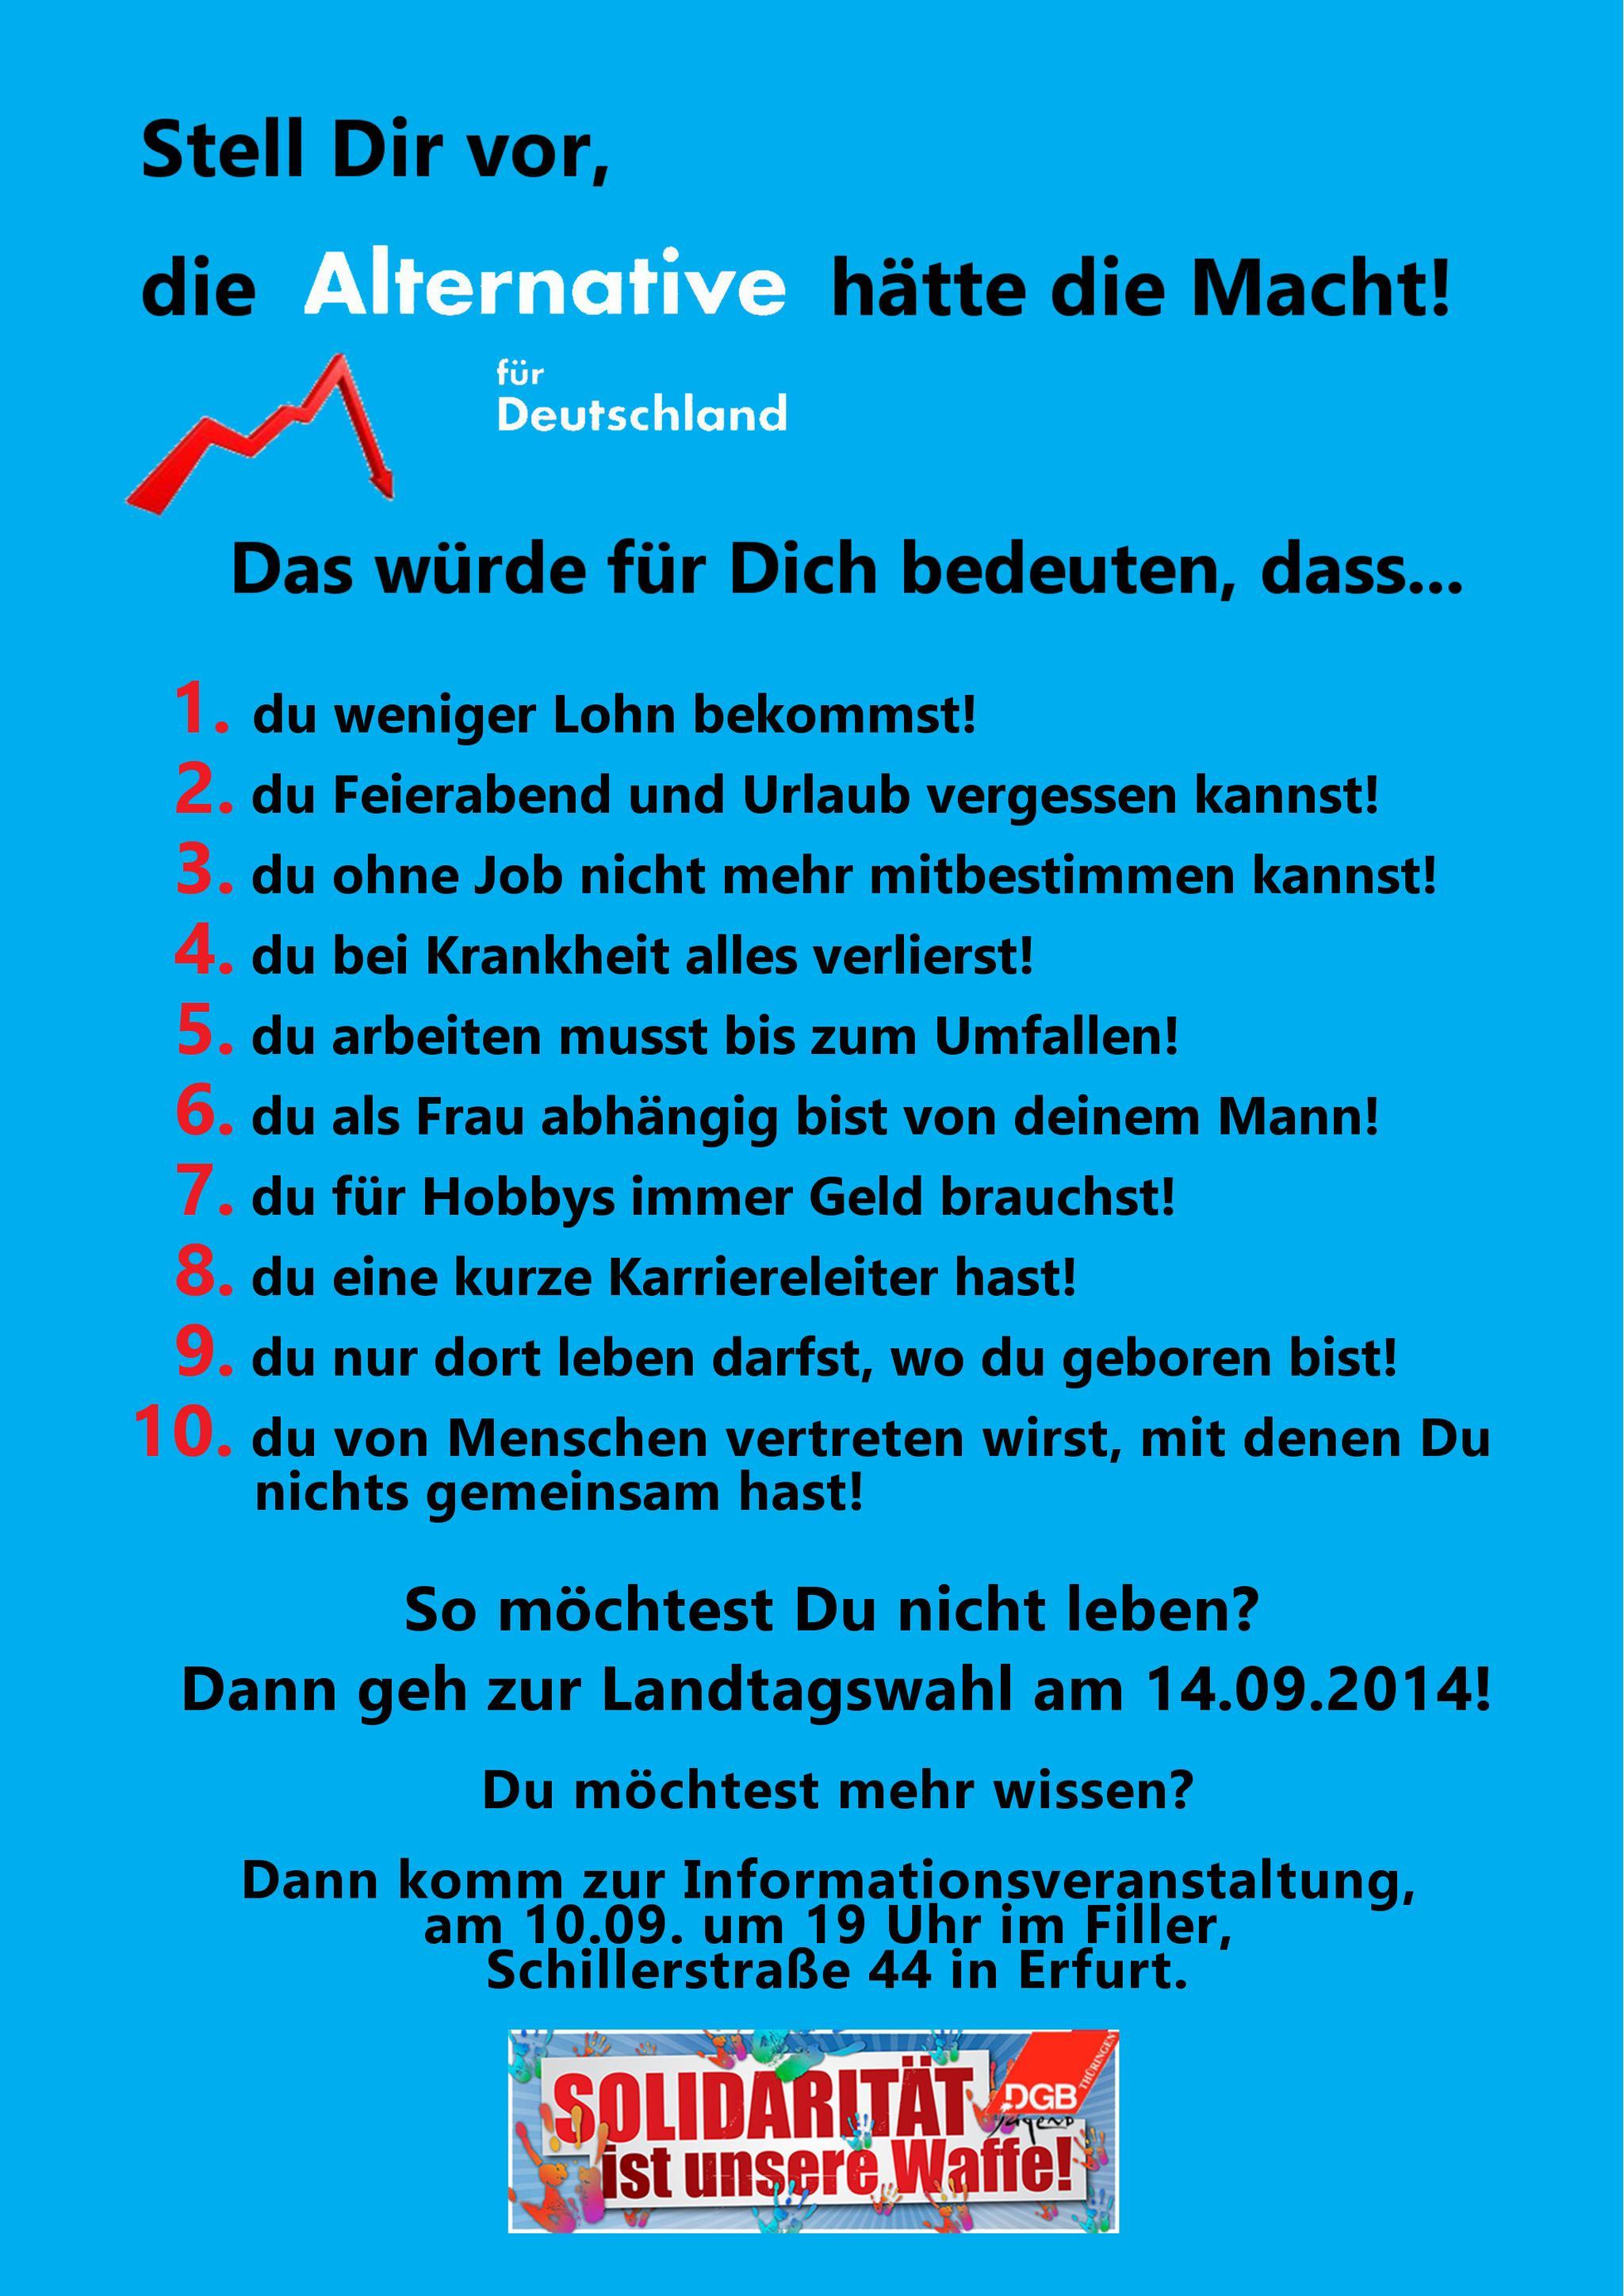 AfD-Flyer der DGB-Jugend vorderseite